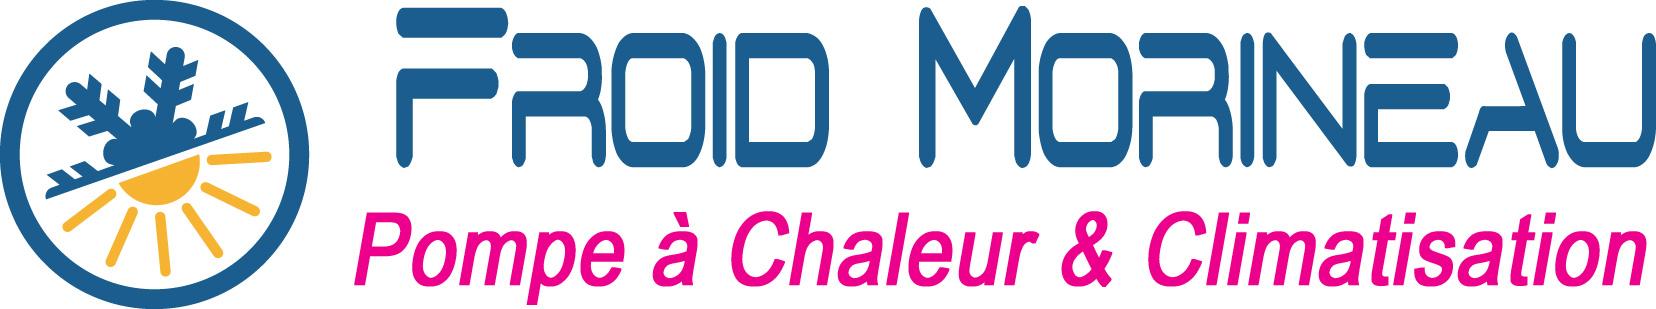 Froid Morineau